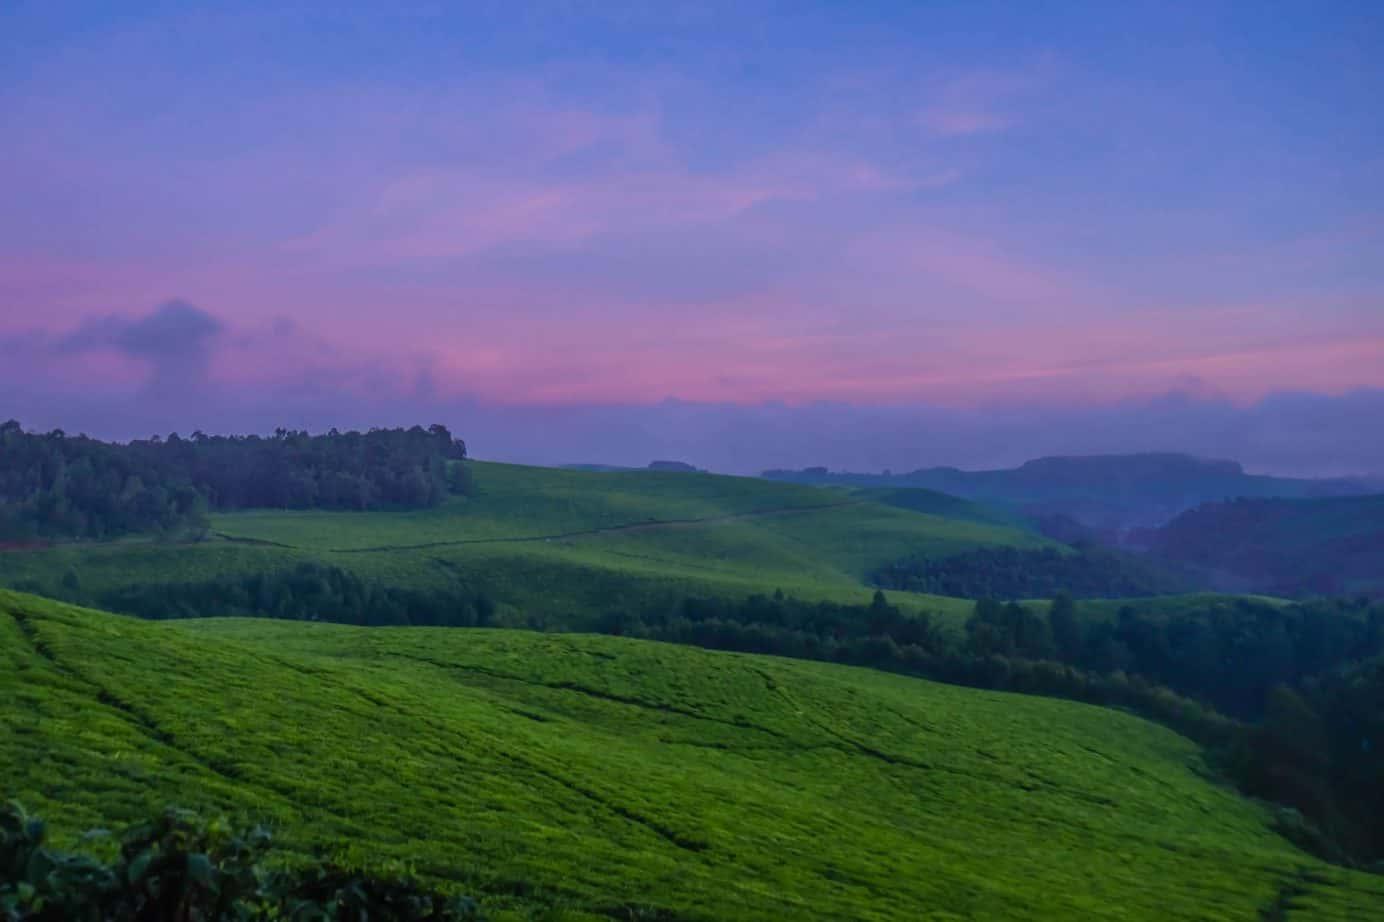 We are in Rwanda